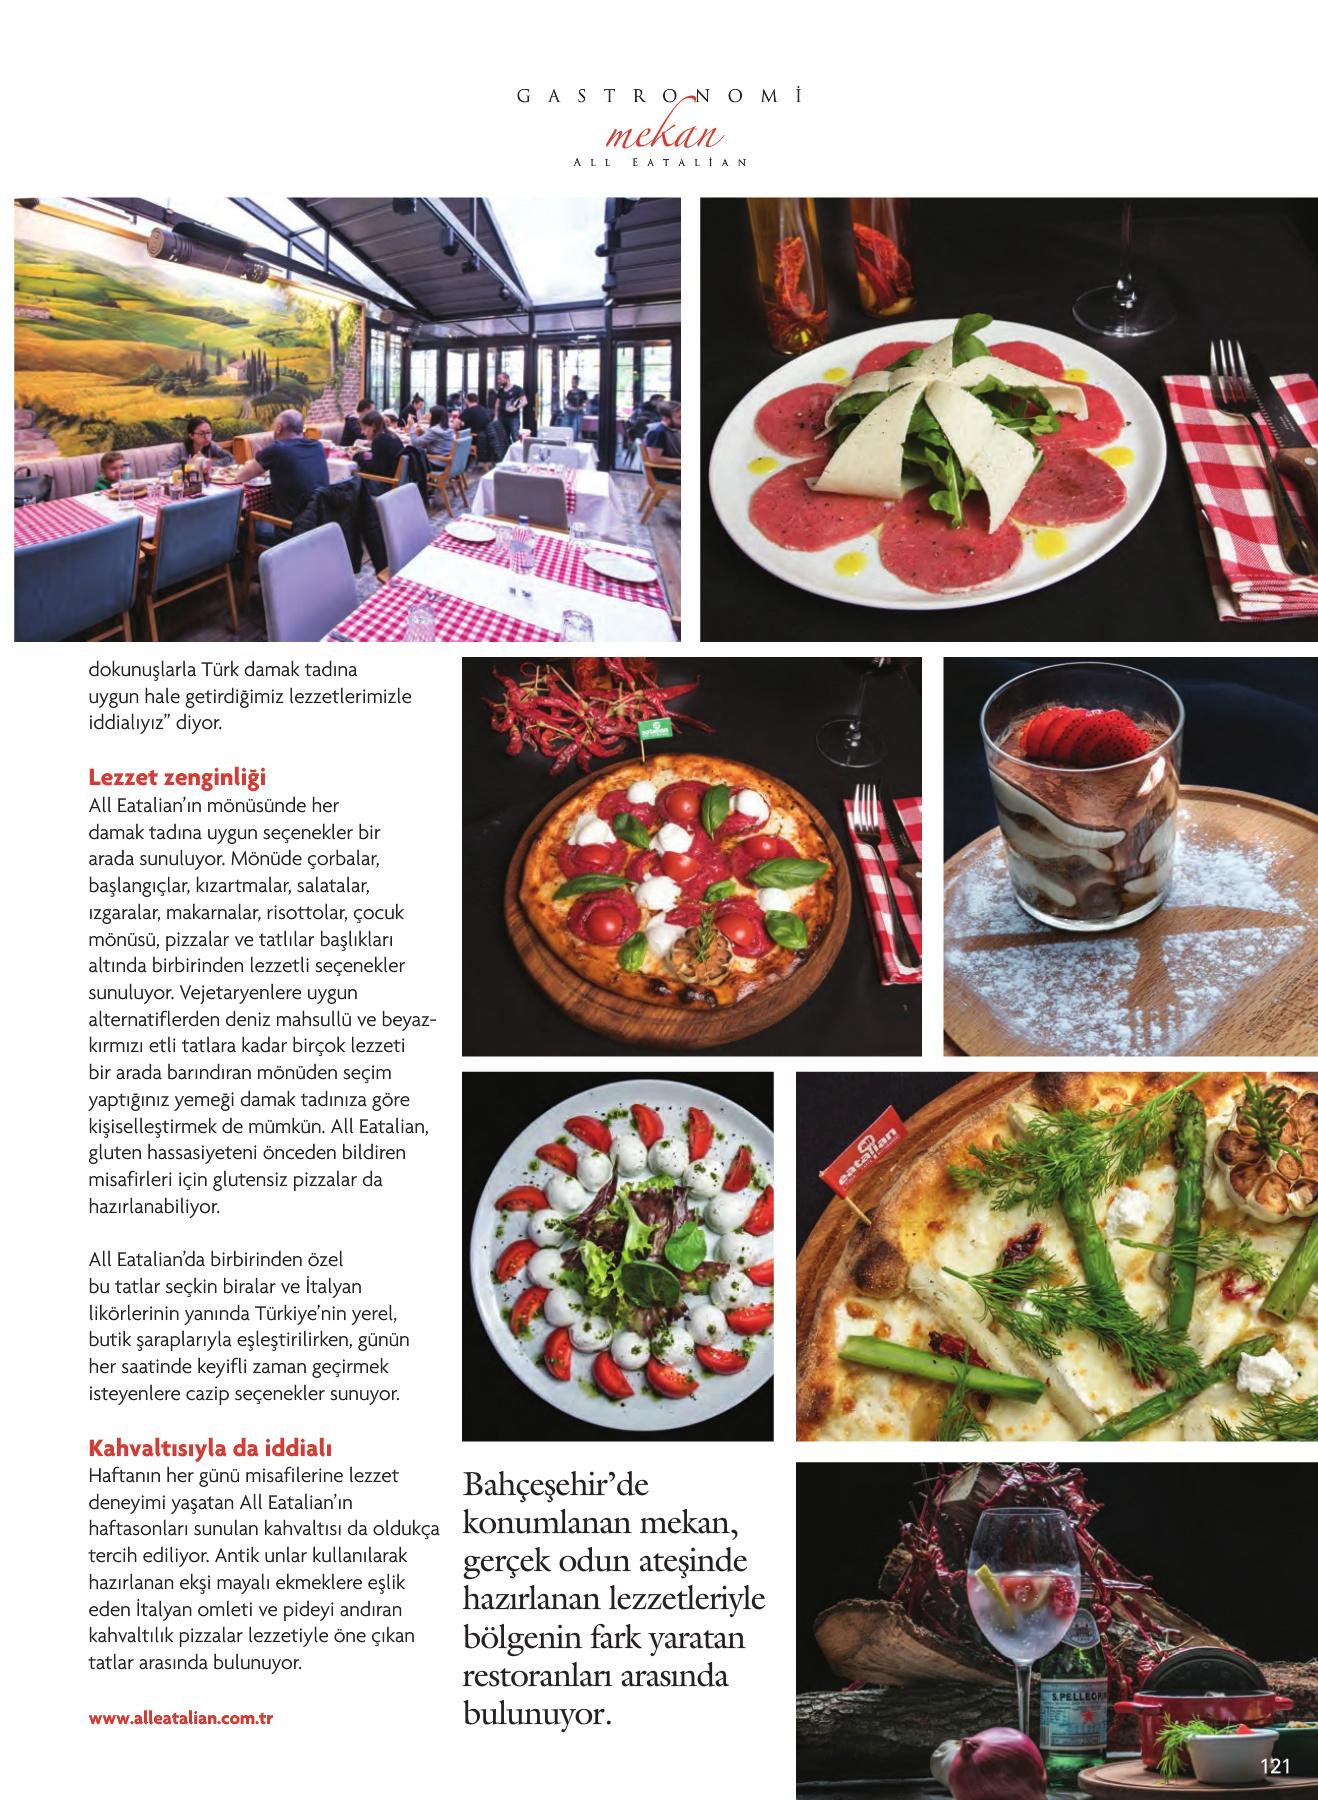 Alleatalian Gastronomi Dergisinde!